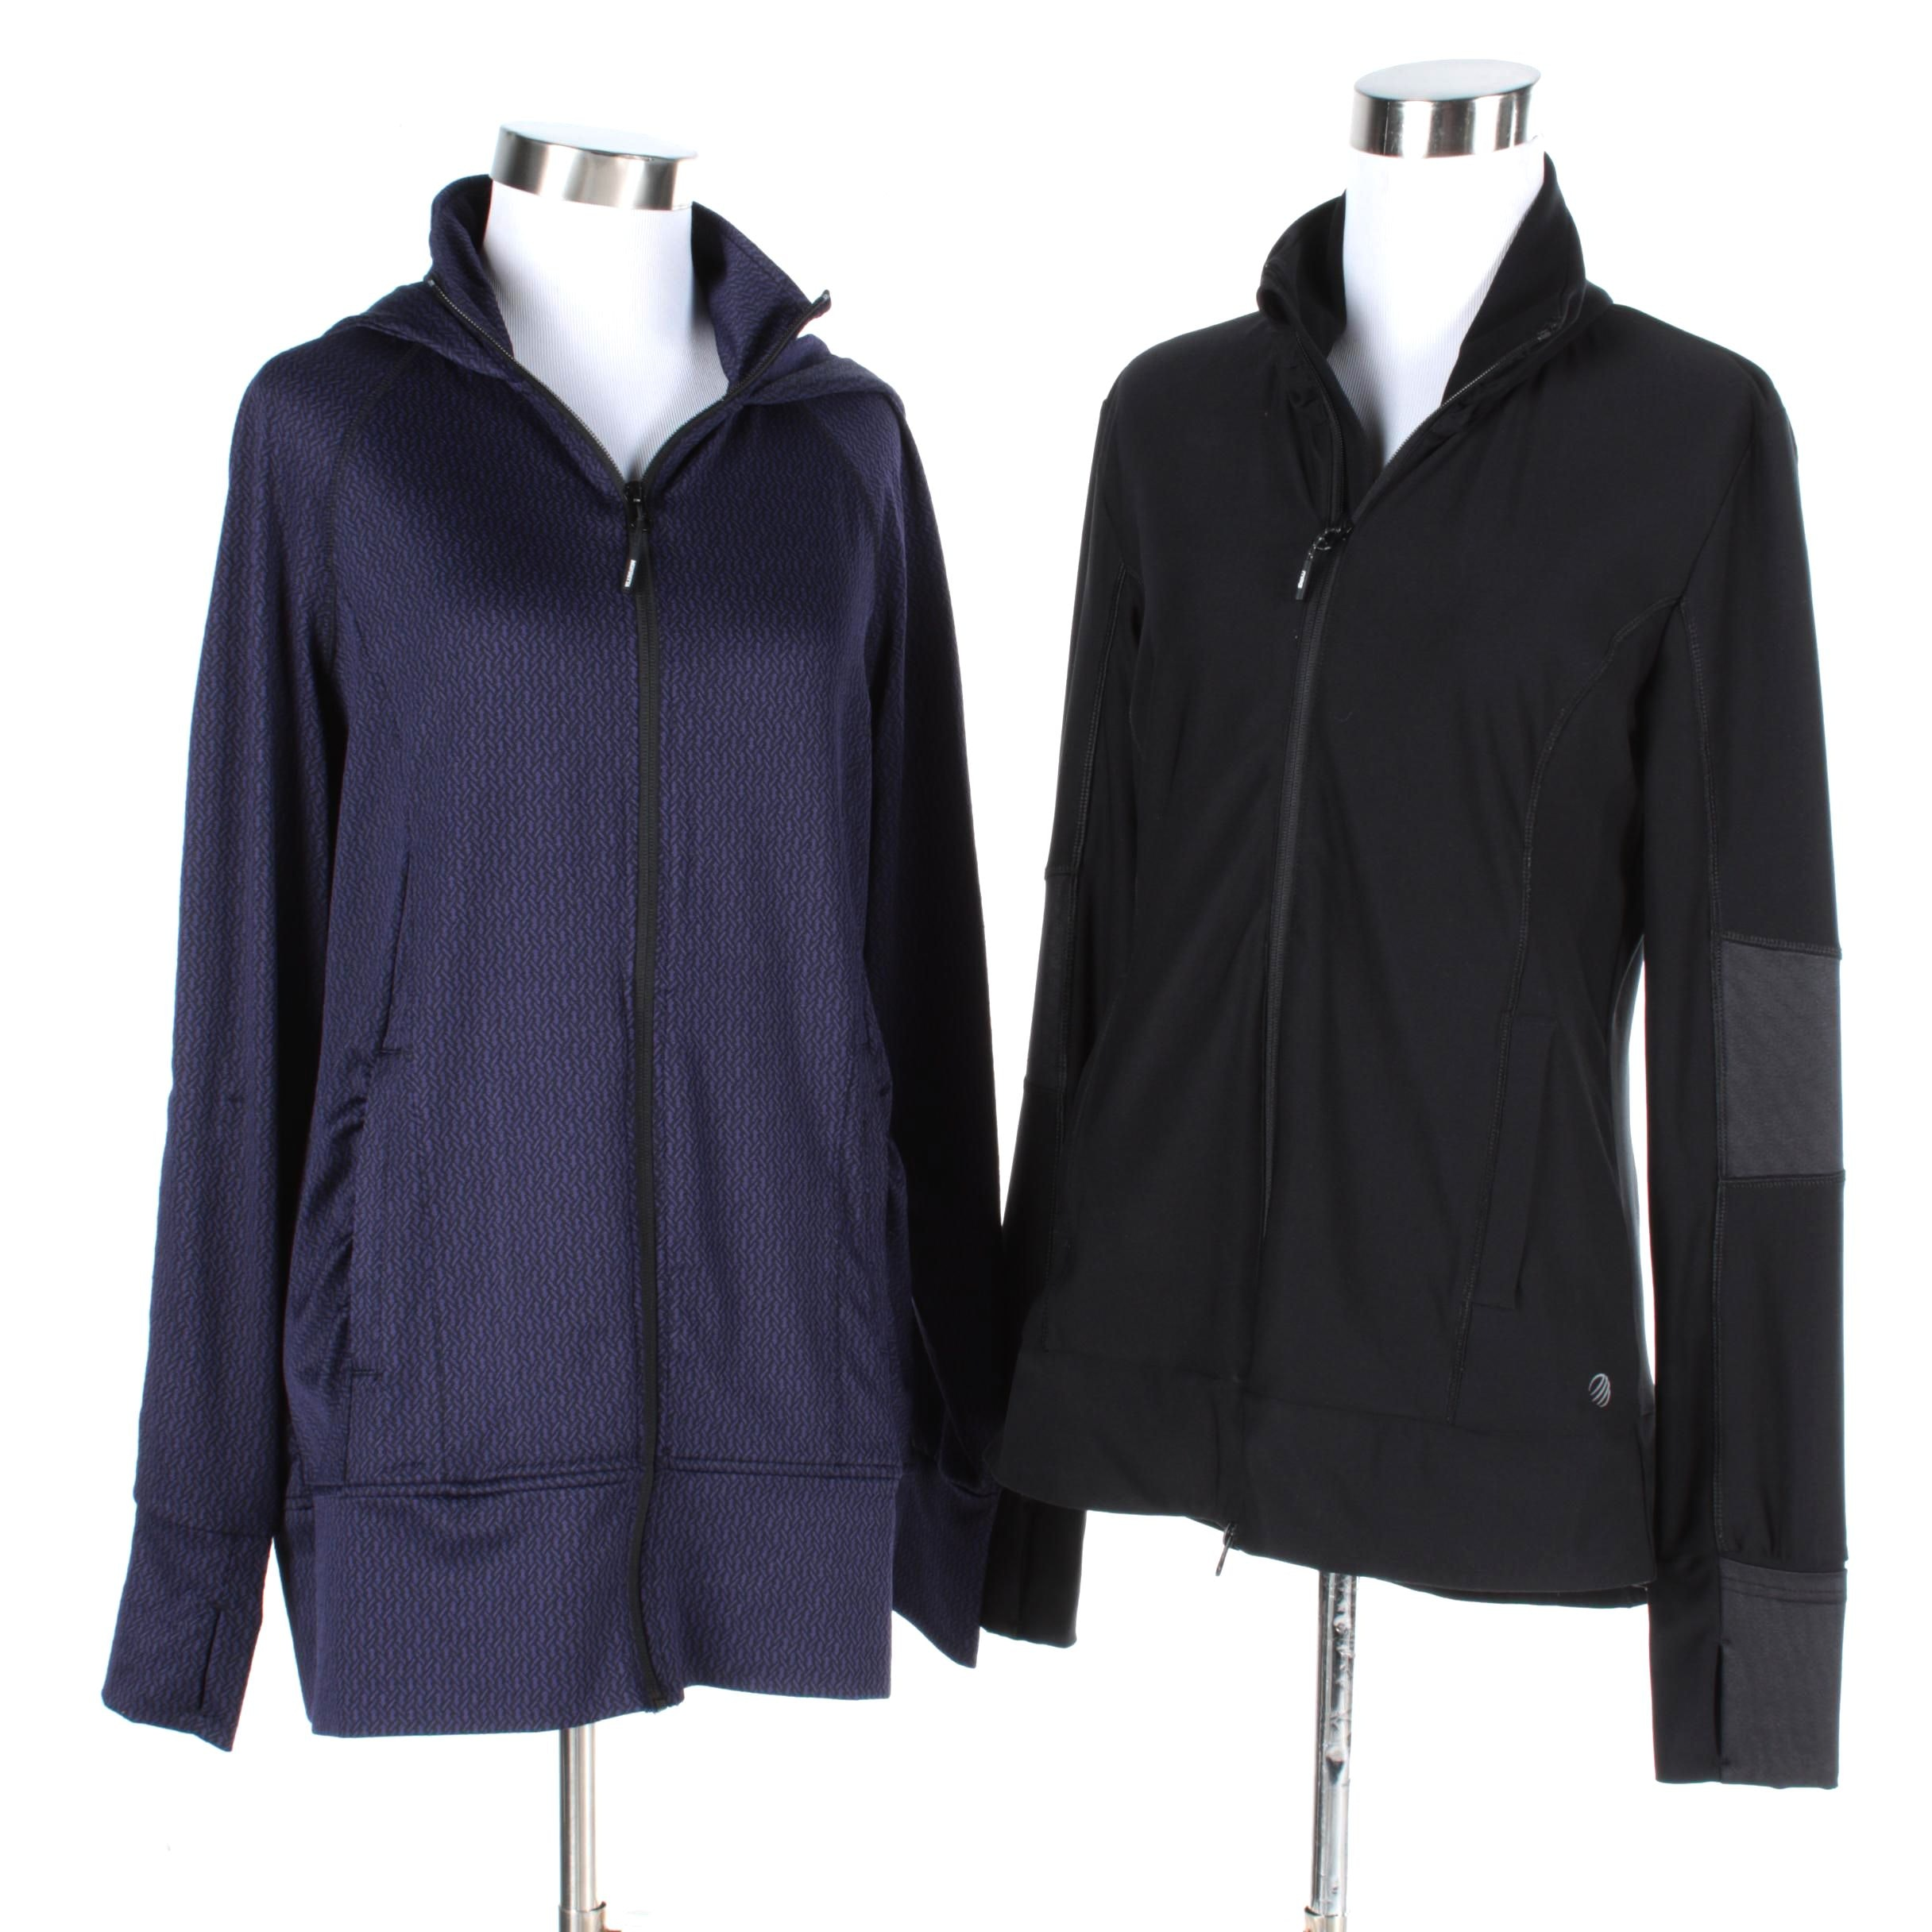 Women's Activewear Jackets Including Mondetta